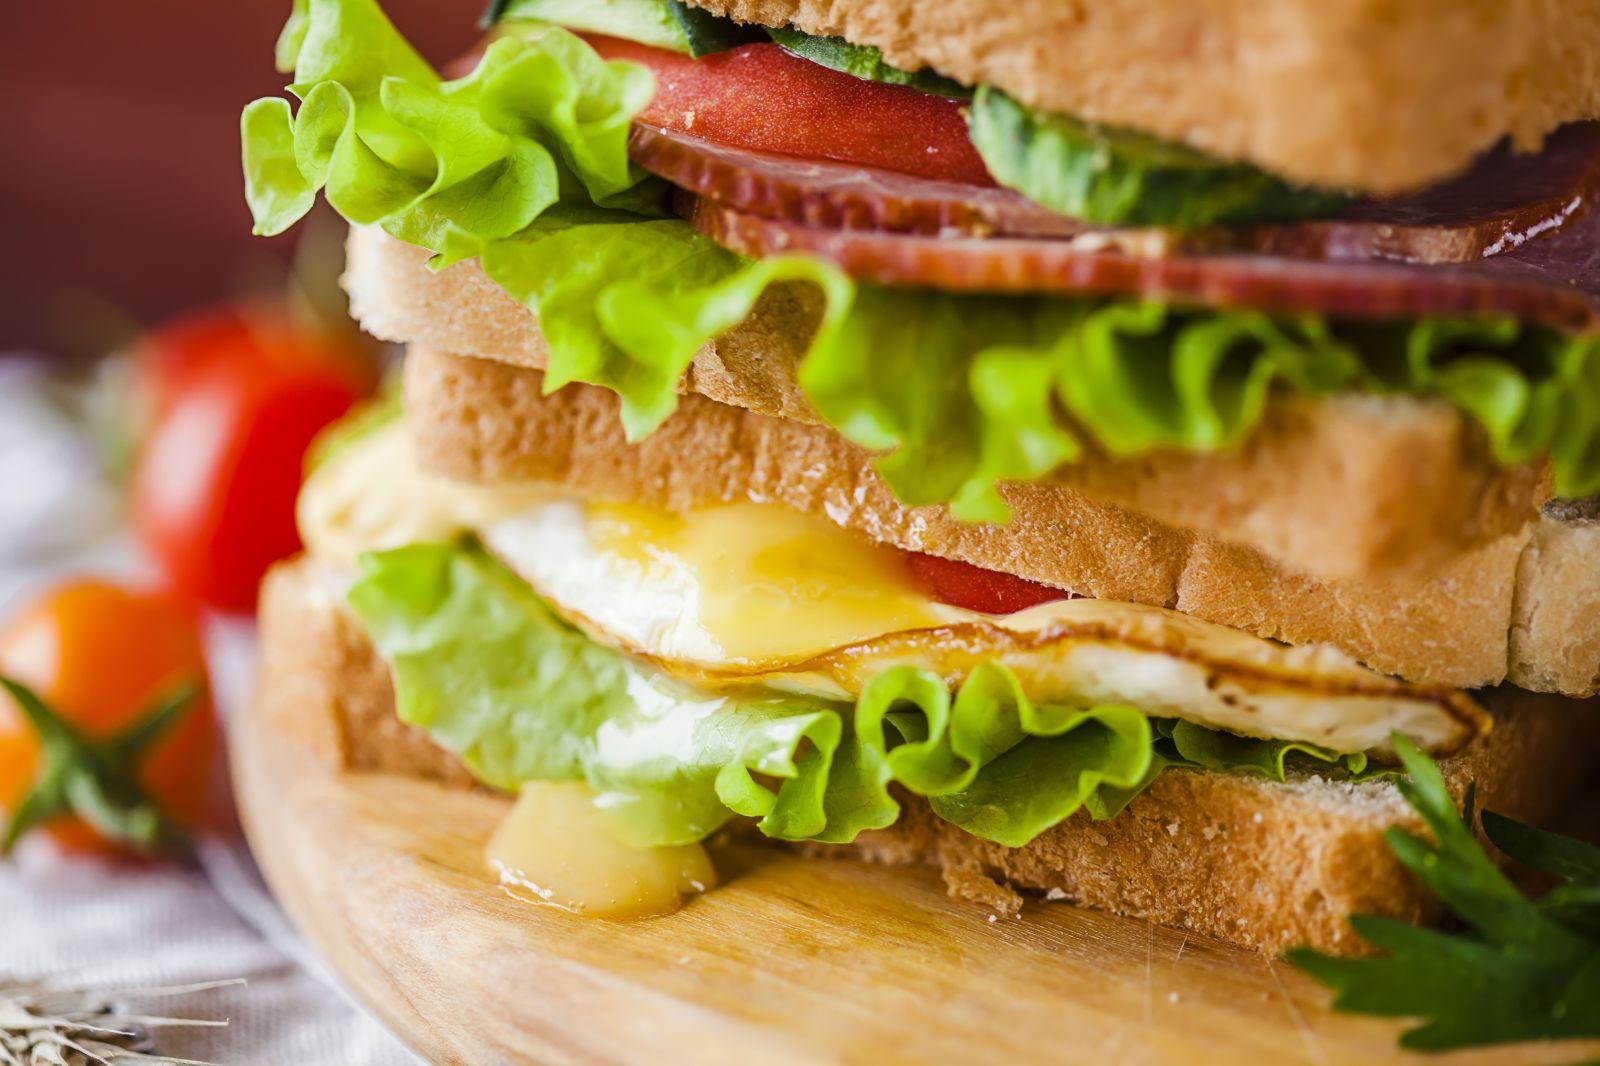 История создания сандвича